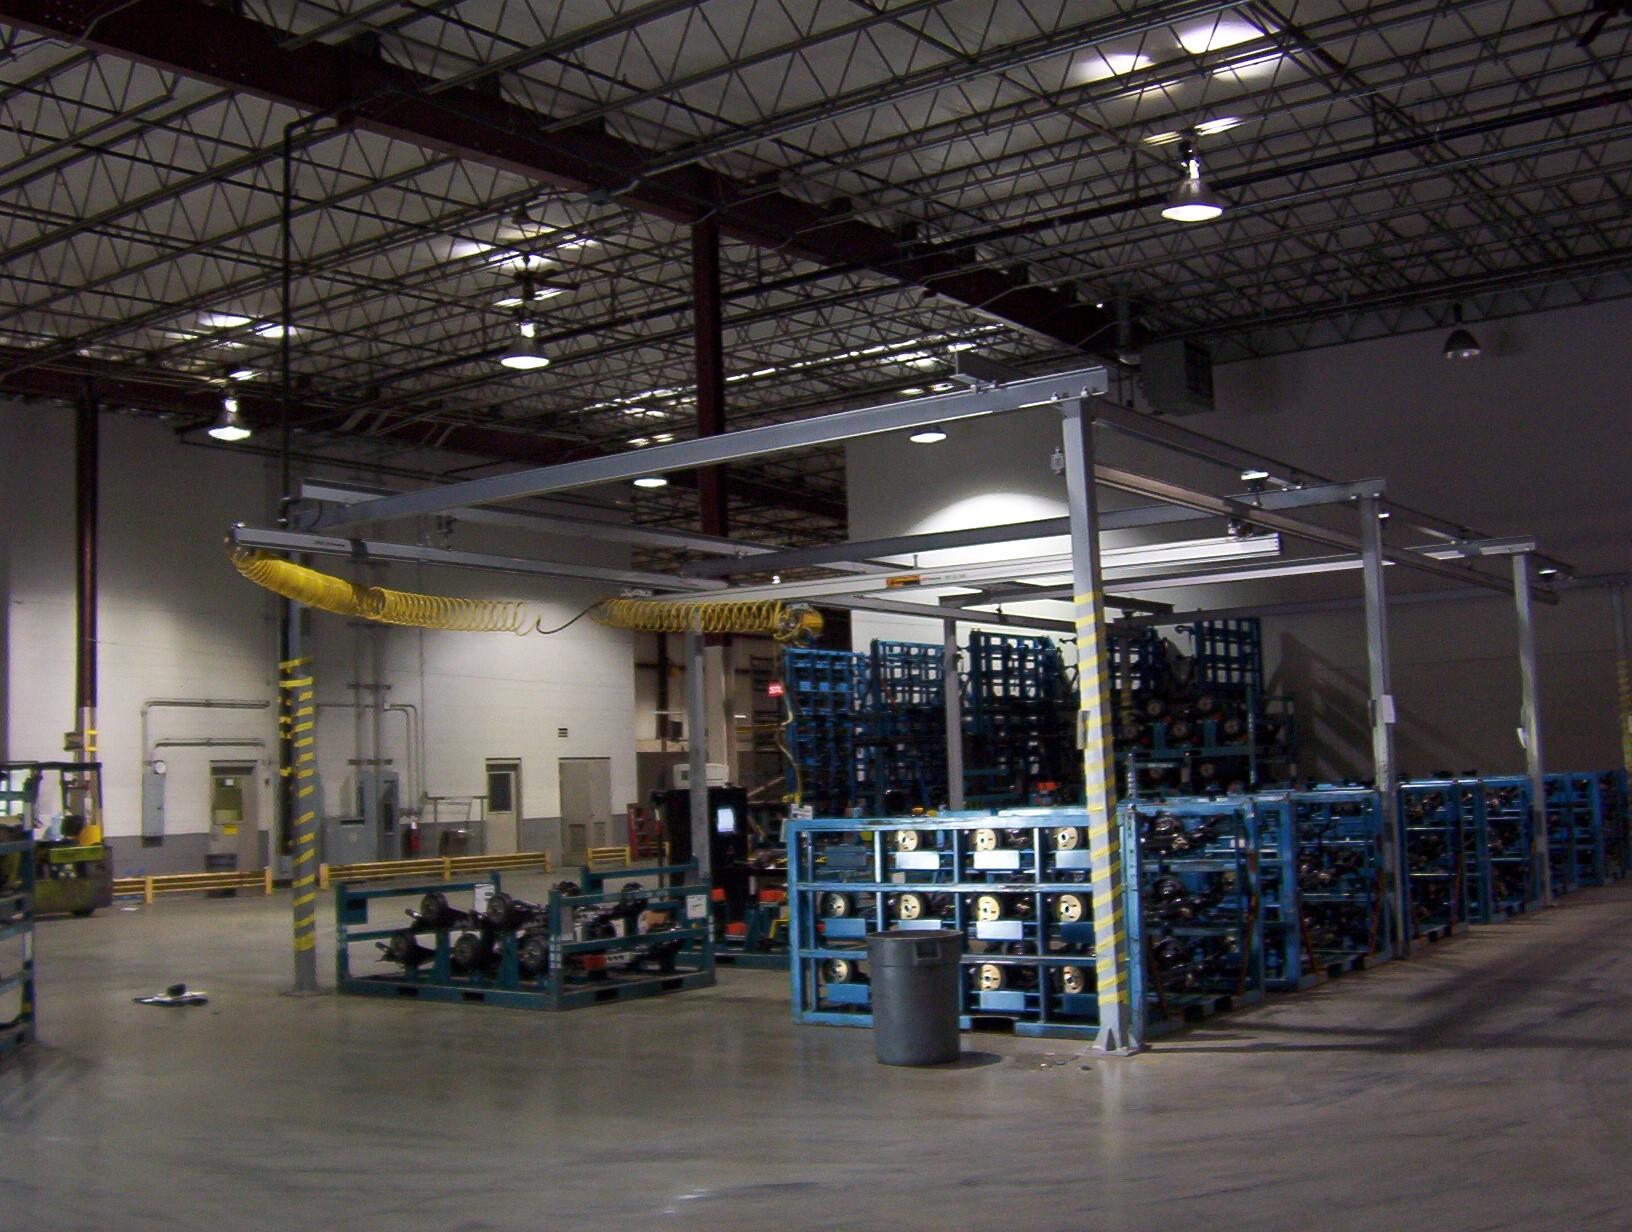 Workstation Crane Systems : Ergonomic workstation crane systems ohio tool